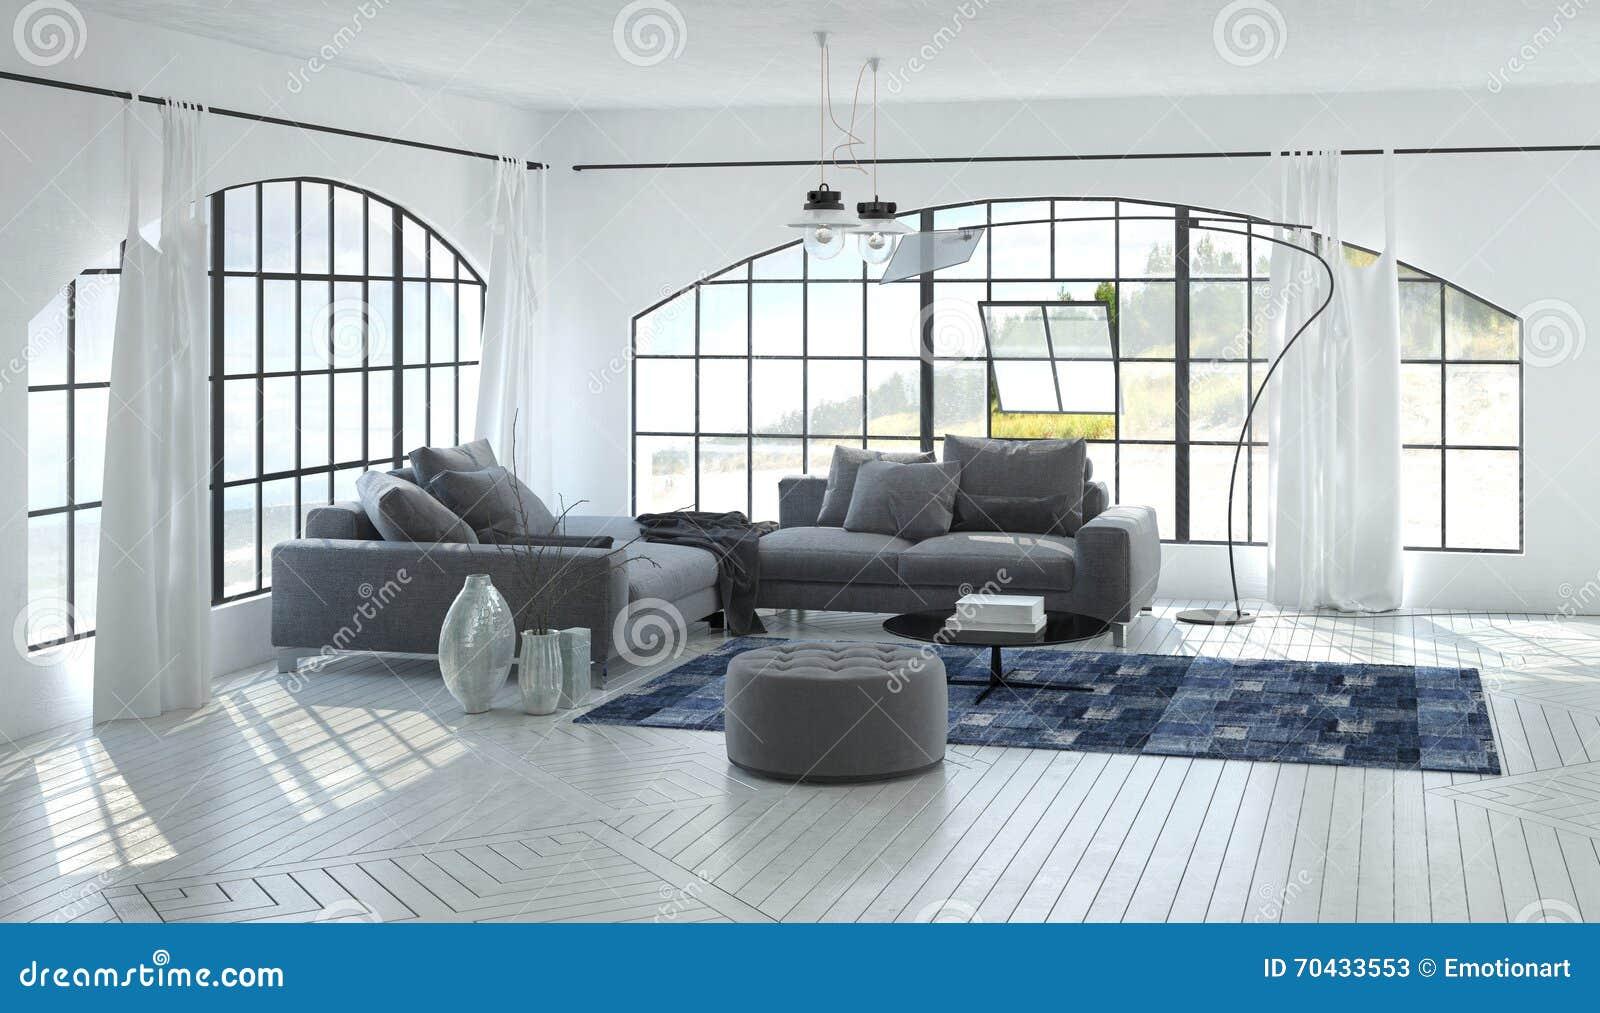 Lichte Luchtige Woonkamer : D woonkamerbinnenland van luchtige woonkamer stock afbeelding